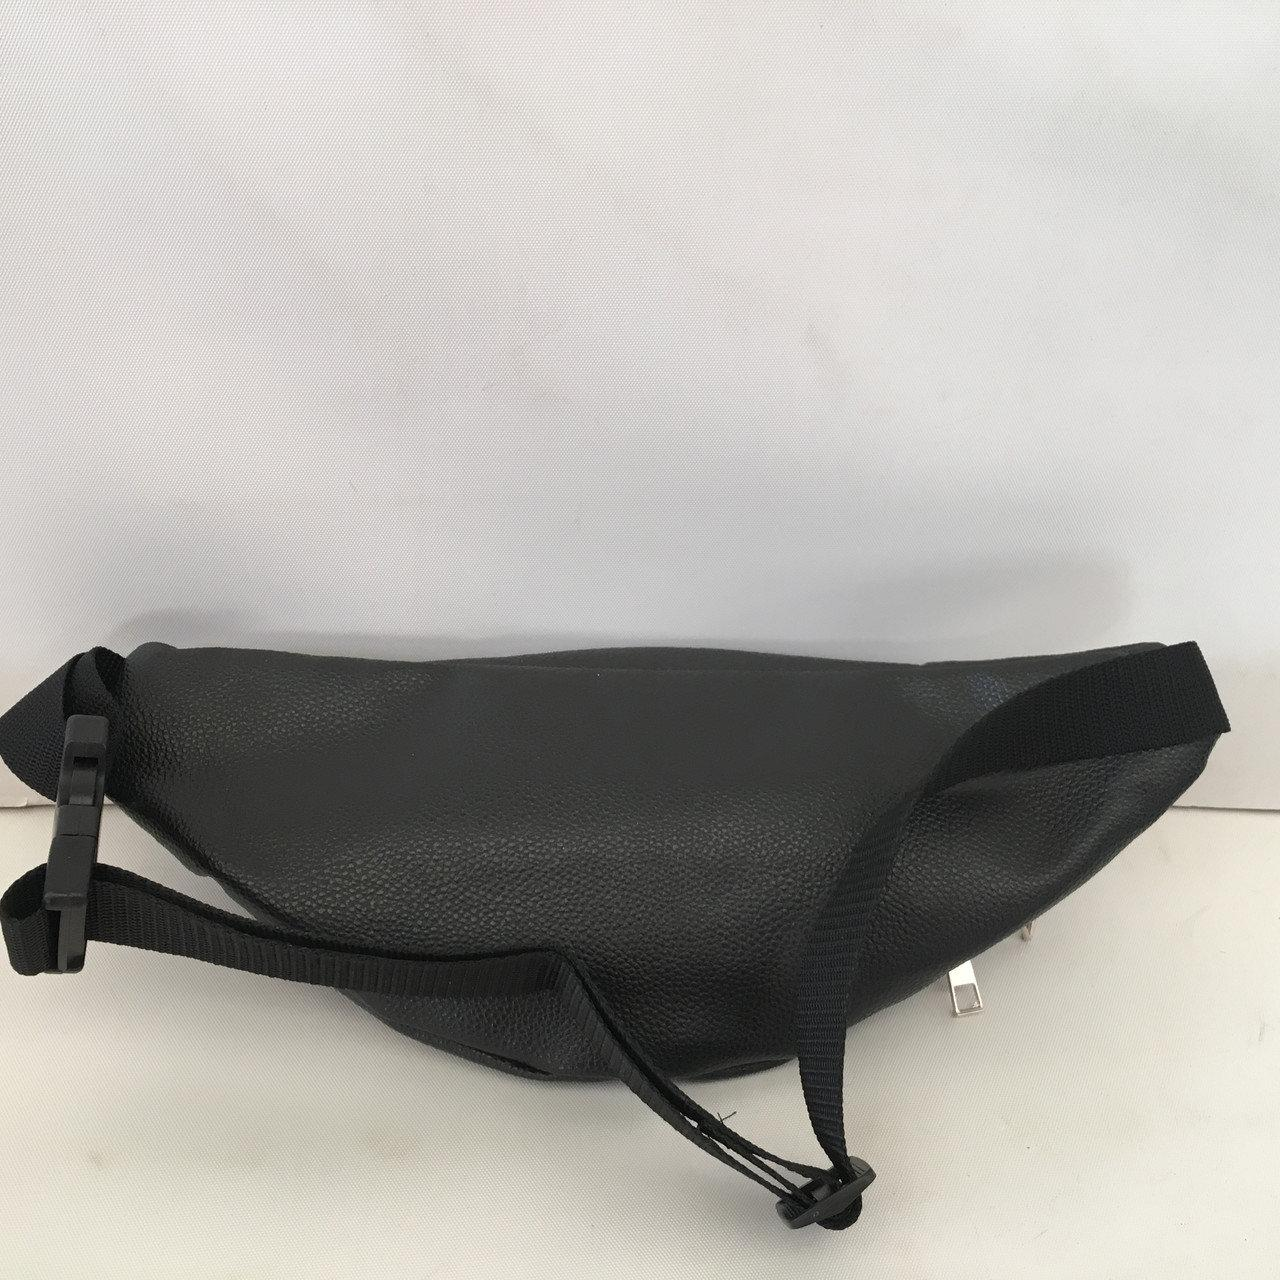 Бананка поясная сумка/ сумка на пояс женская  мужская VLTN экокожа. 3